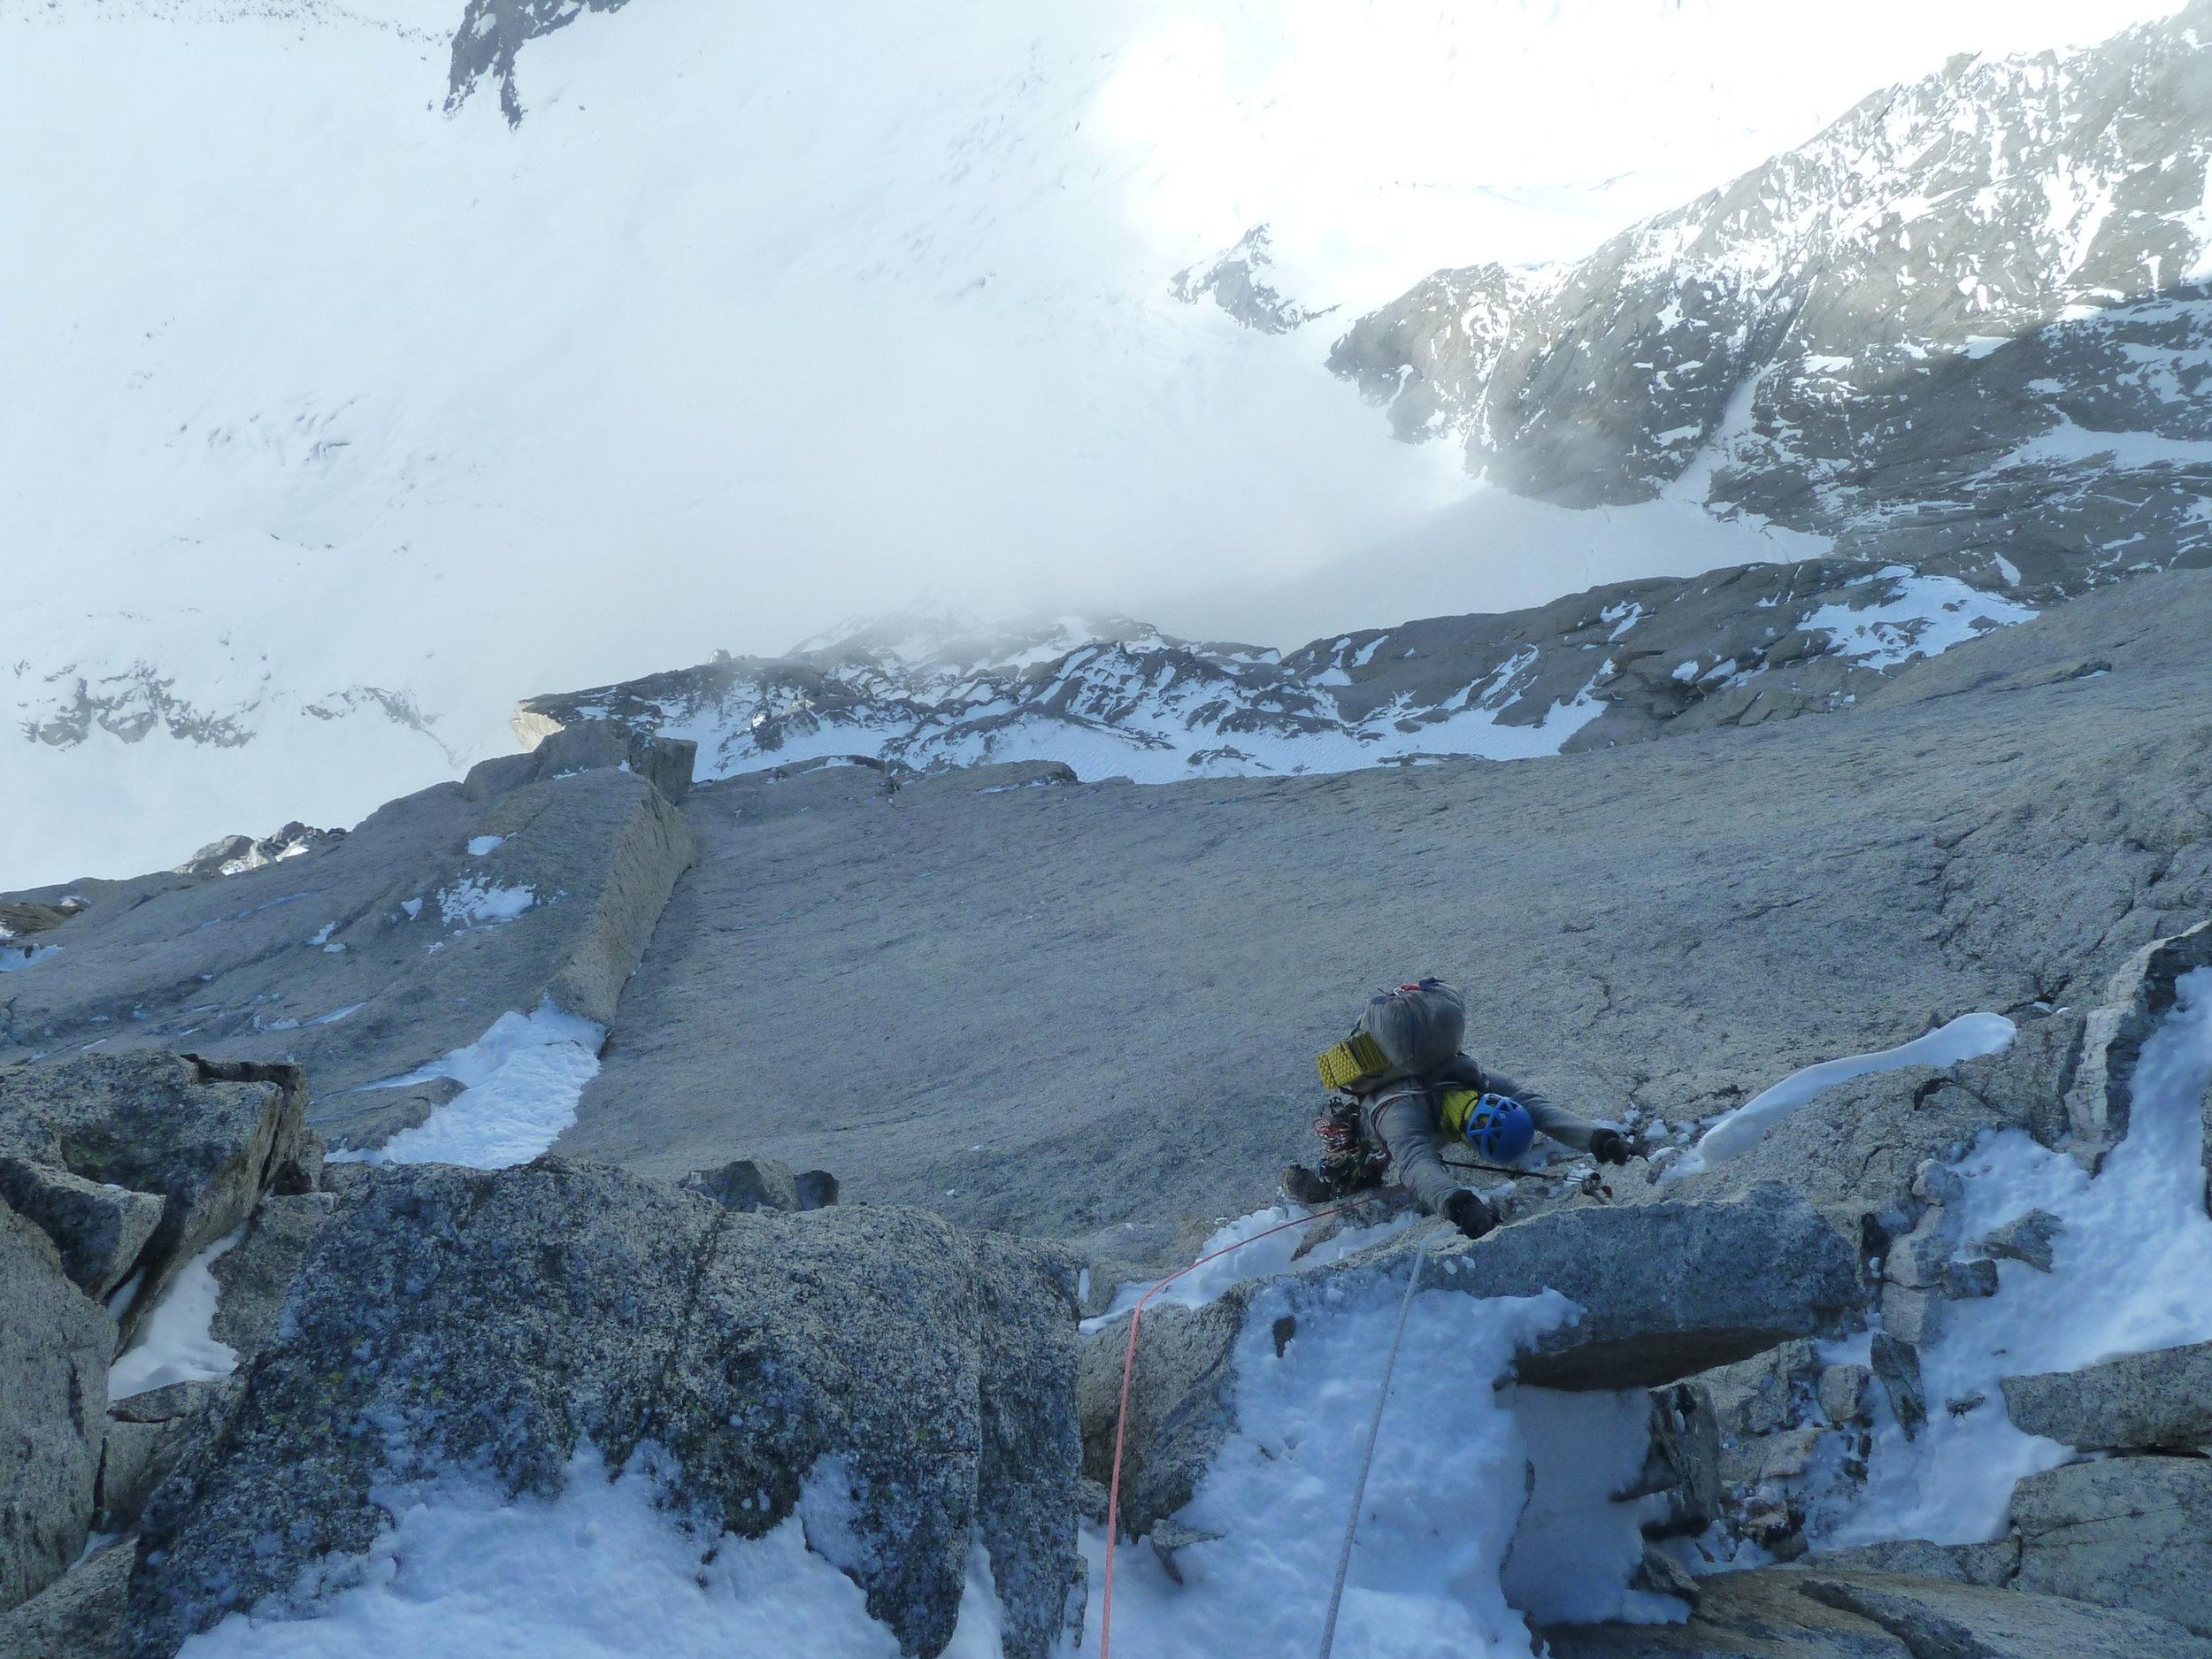 kim ladiges on the pierre allain/classic route, le dru, mont blanc massif. chamonix